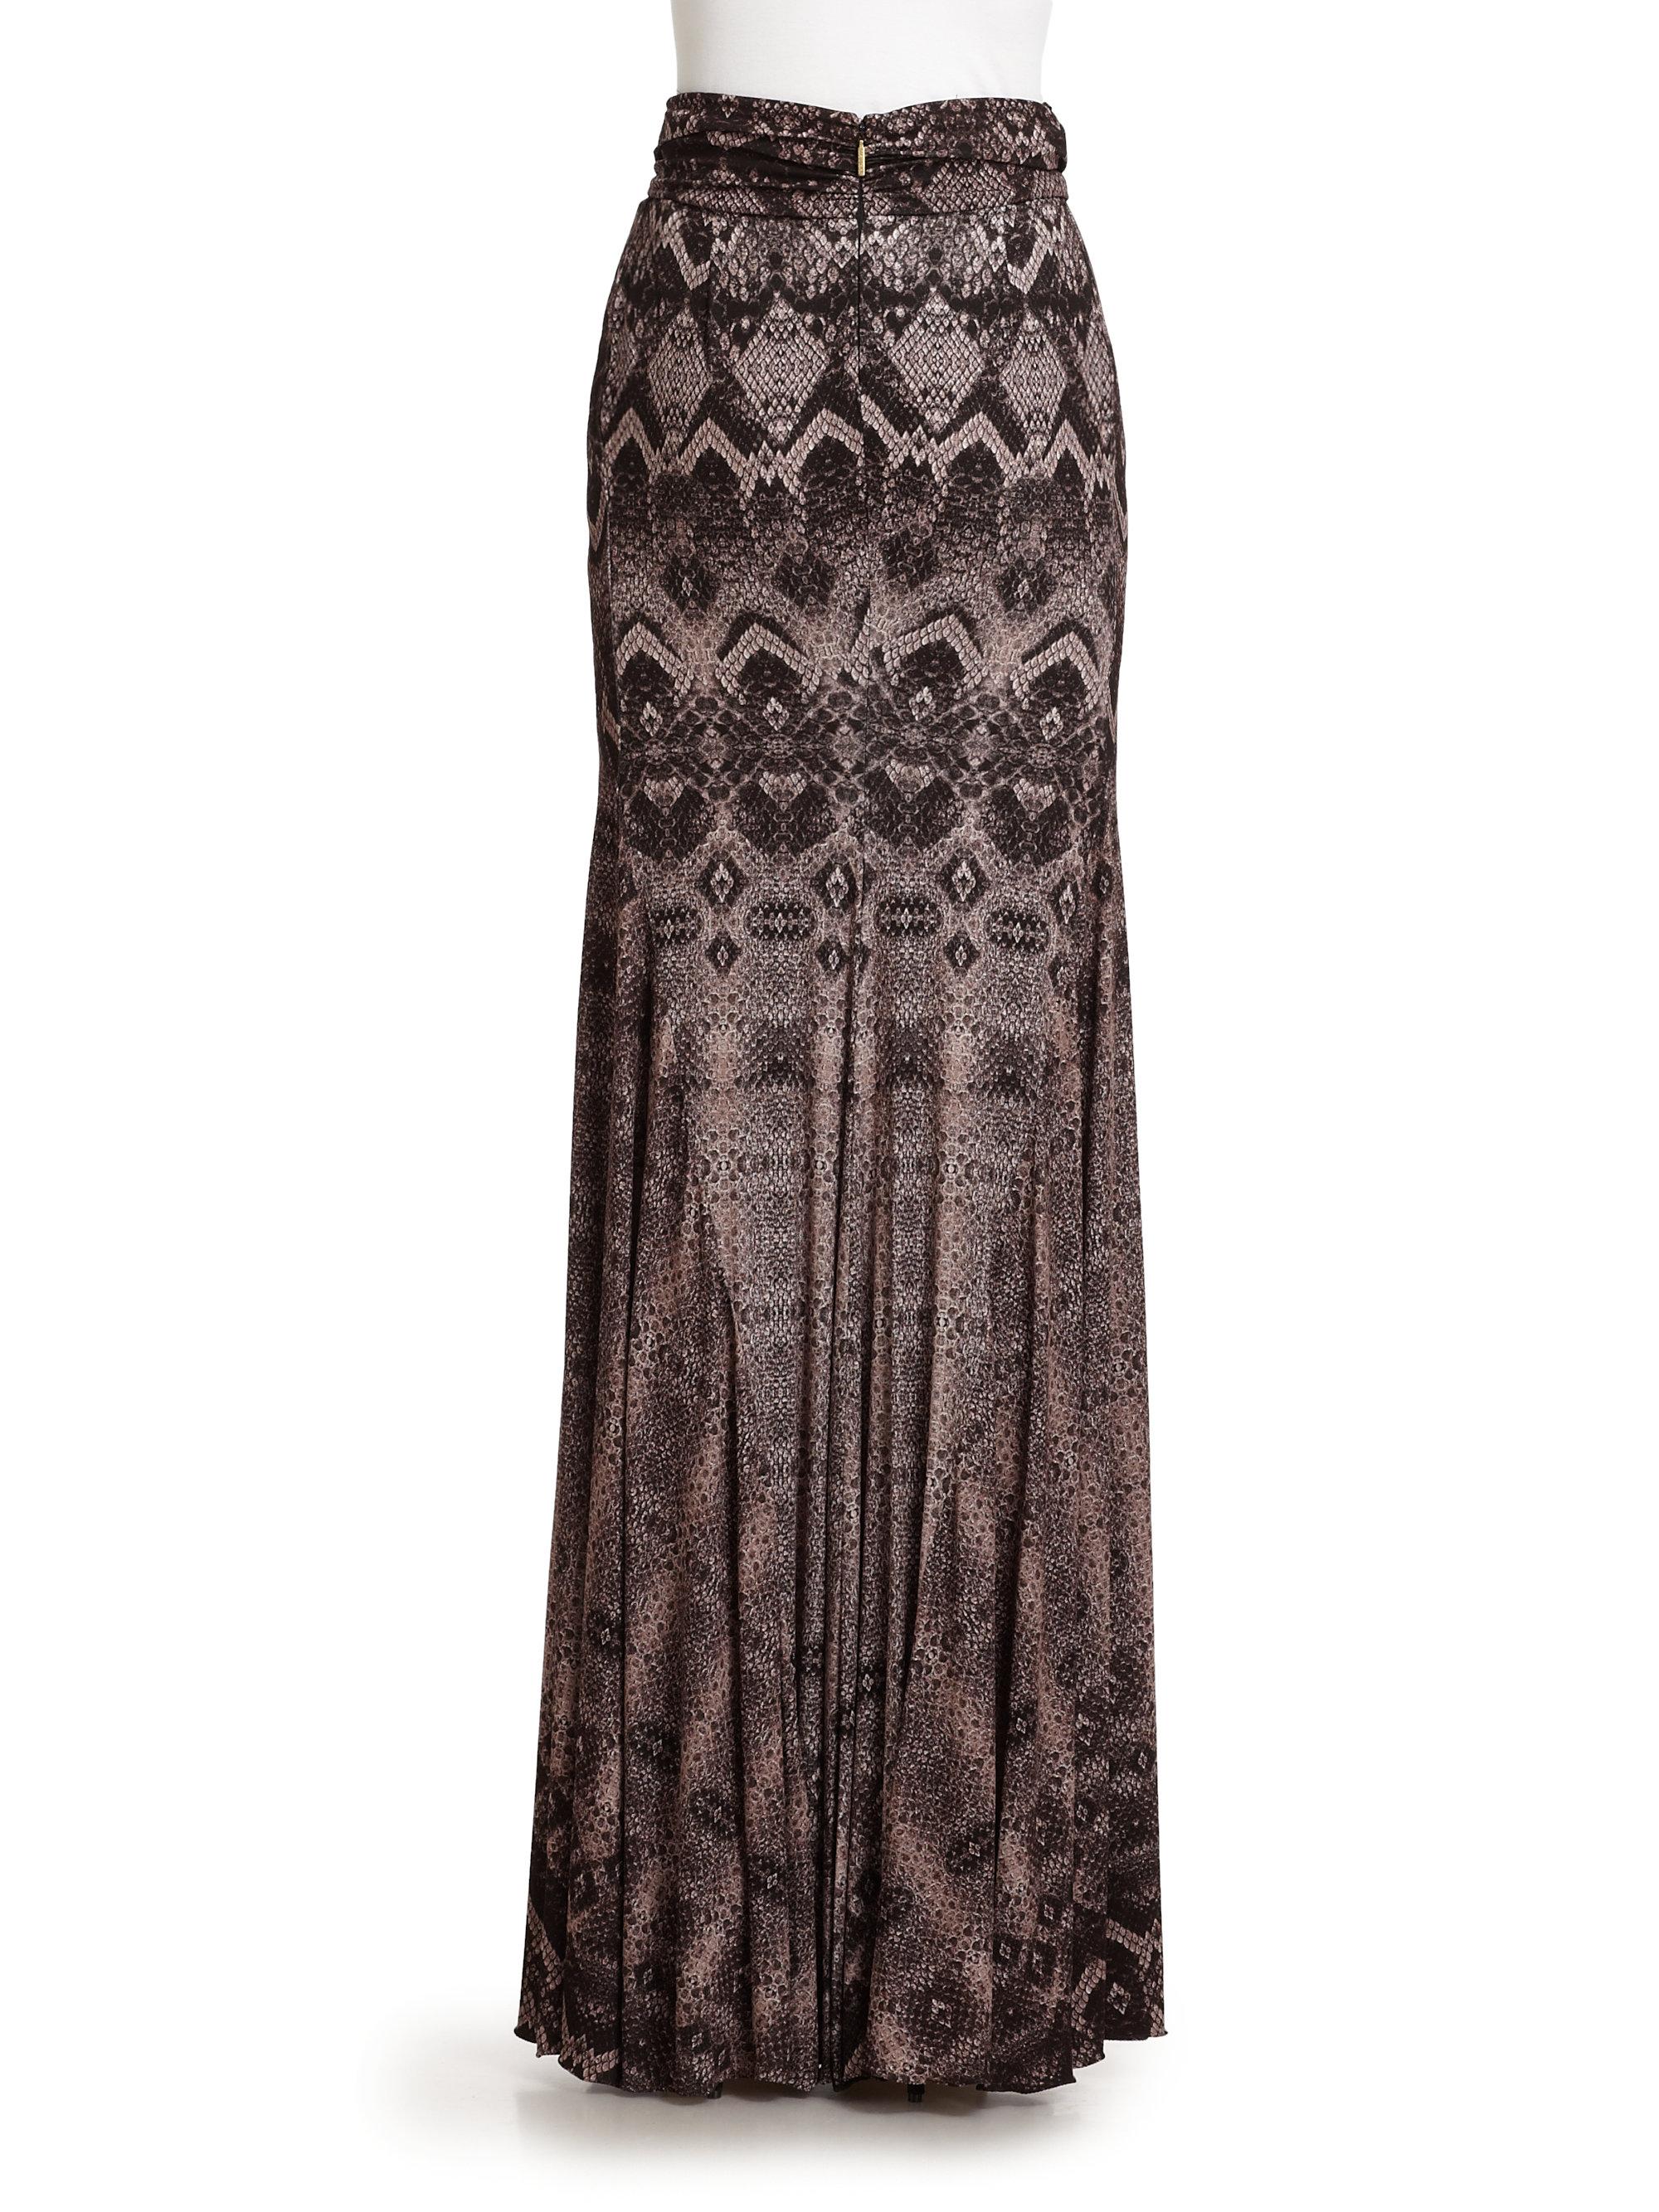 0a7ad5b721585 Roberto Cavalli Snake Print Maxi Skirt in Brown - Lyst